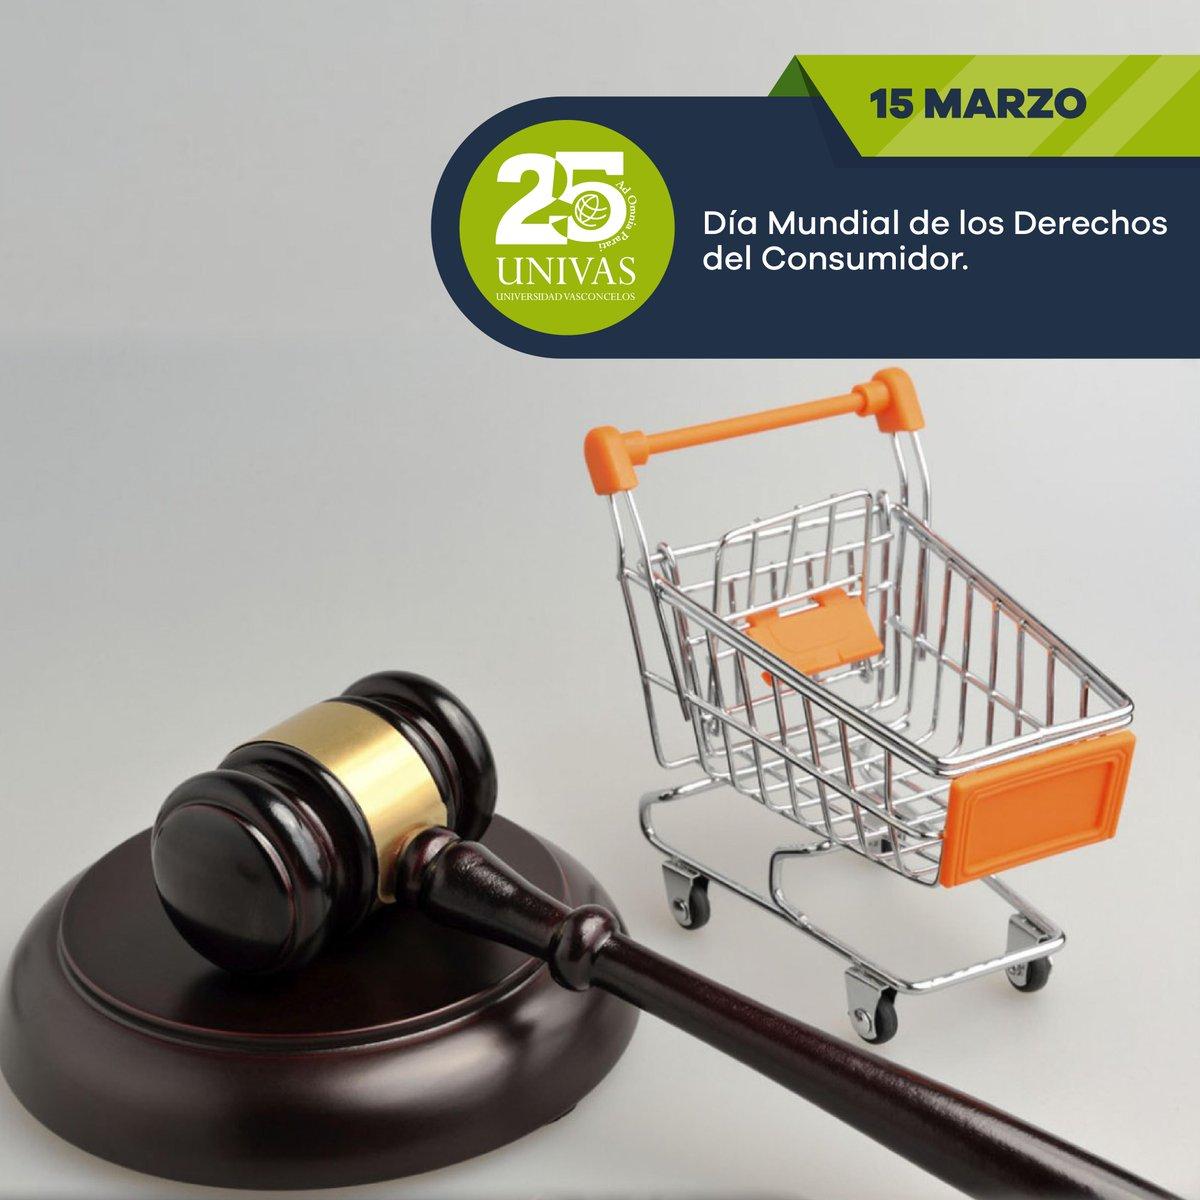 Univas's photo on #DiaMundialDelConsumidor